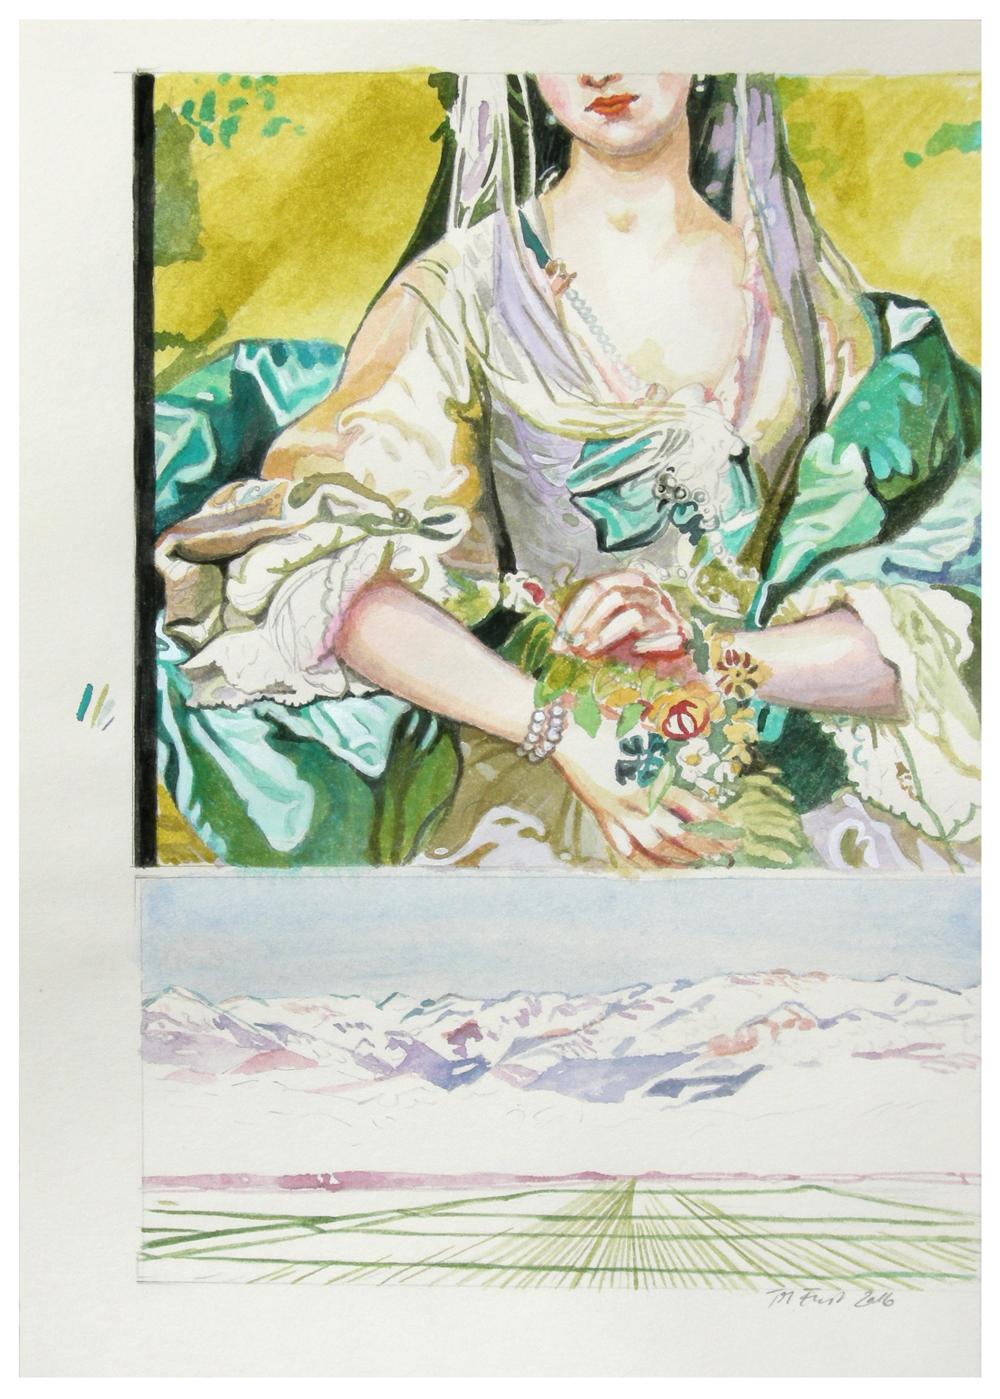 ideale landschaft 07 – rokoko – Aquarell auf Papier, 29,7 x 21 cm, 2016